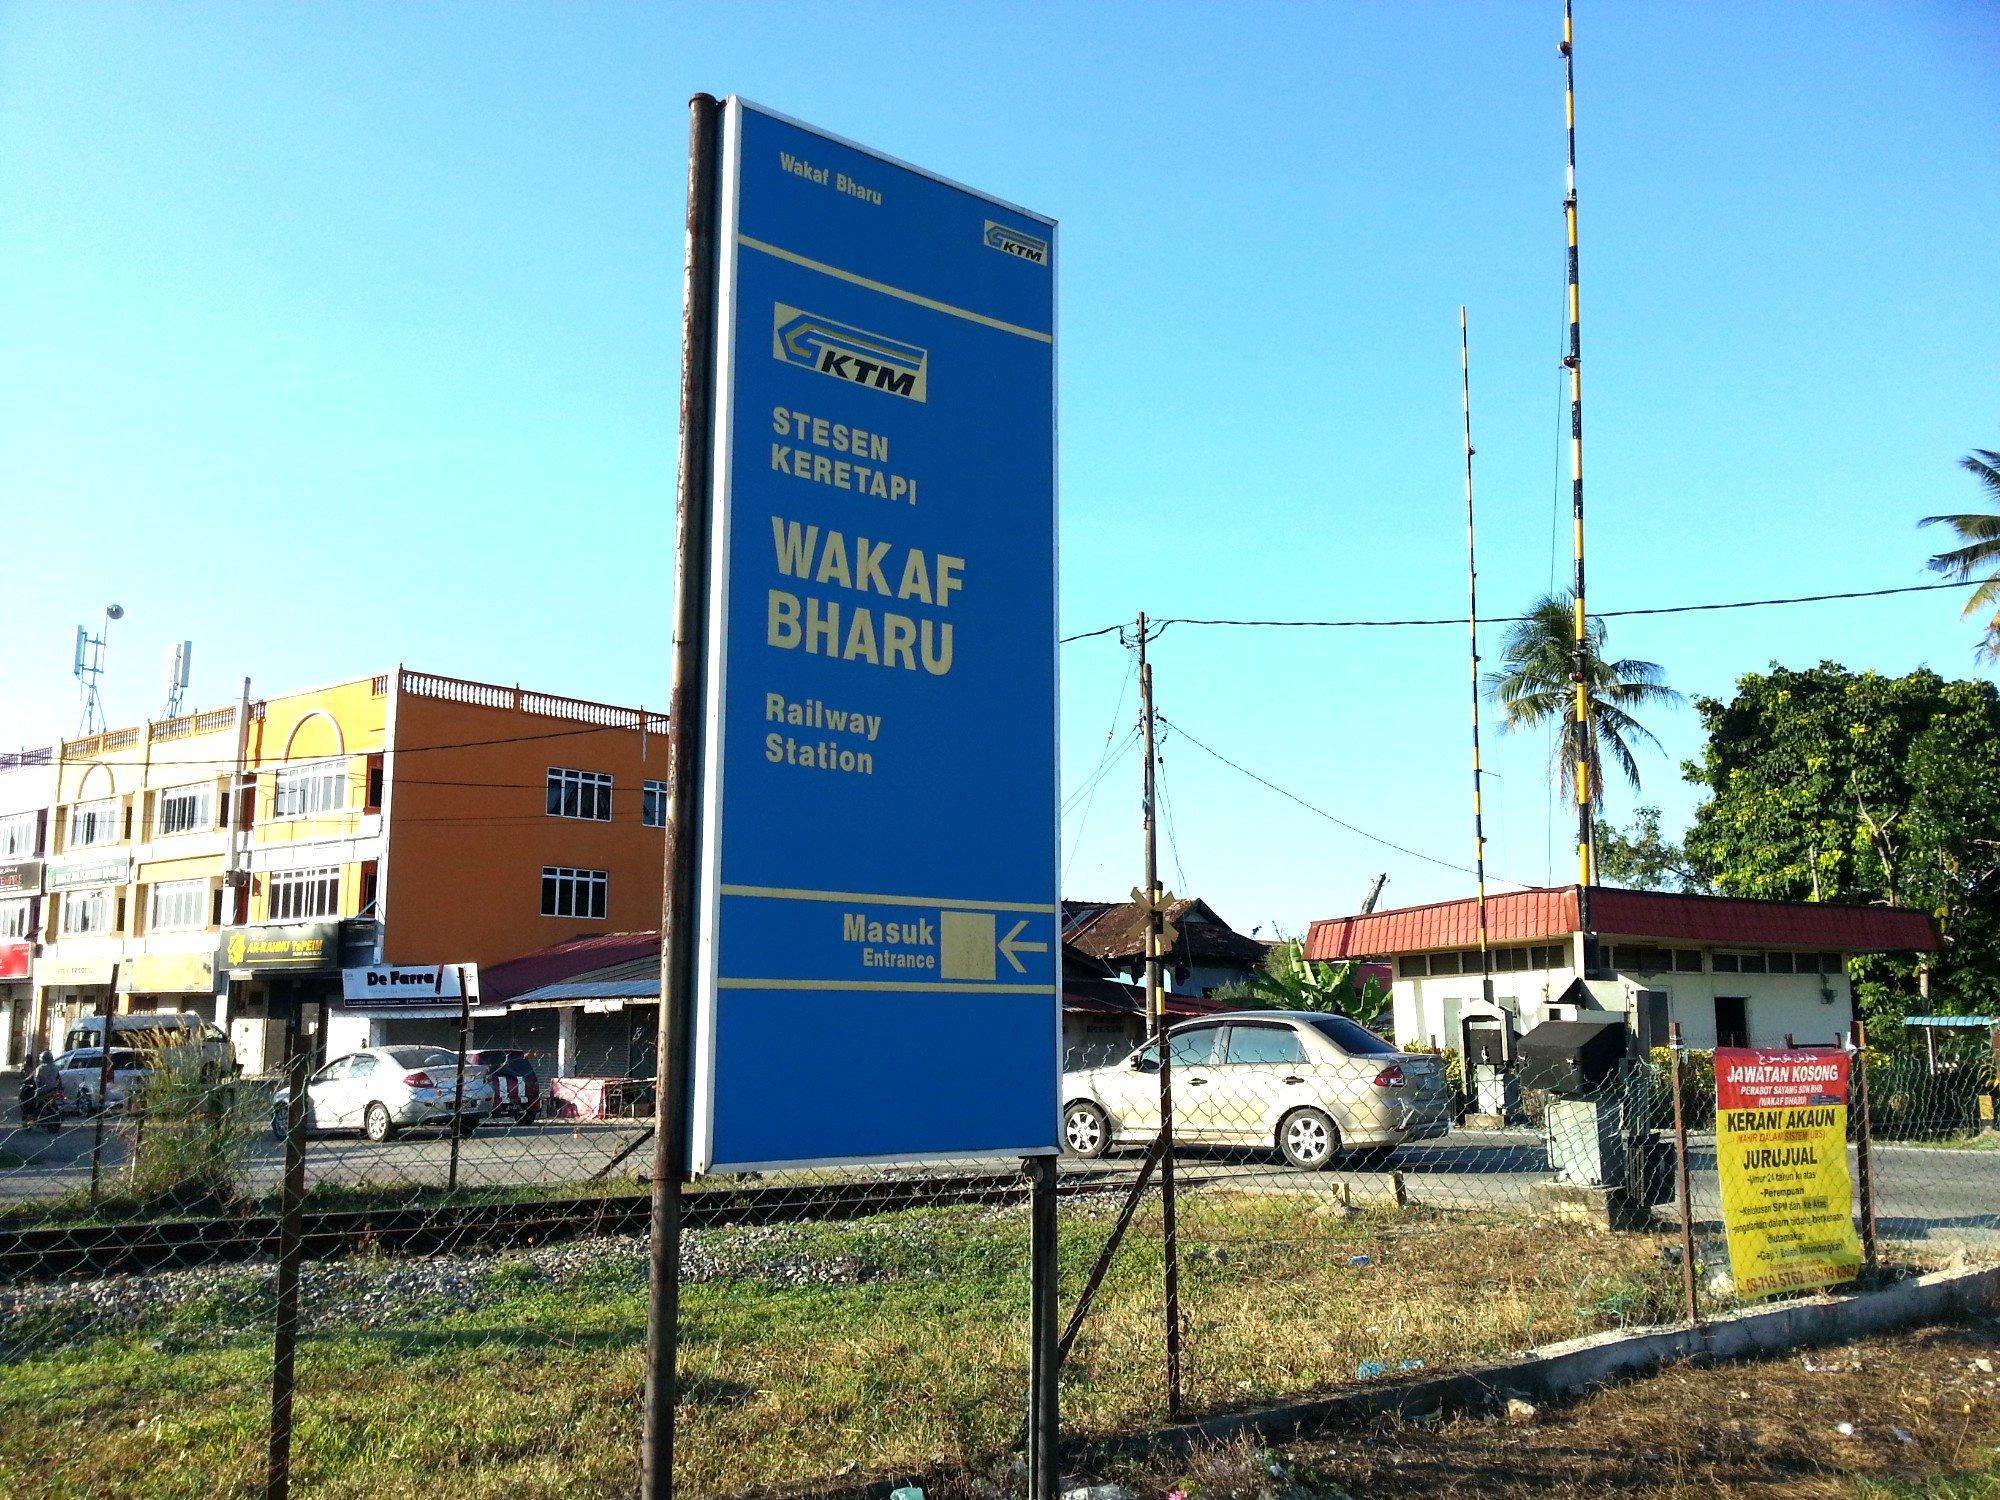 Wakaf Bharu Railway Station near Kota Bharu